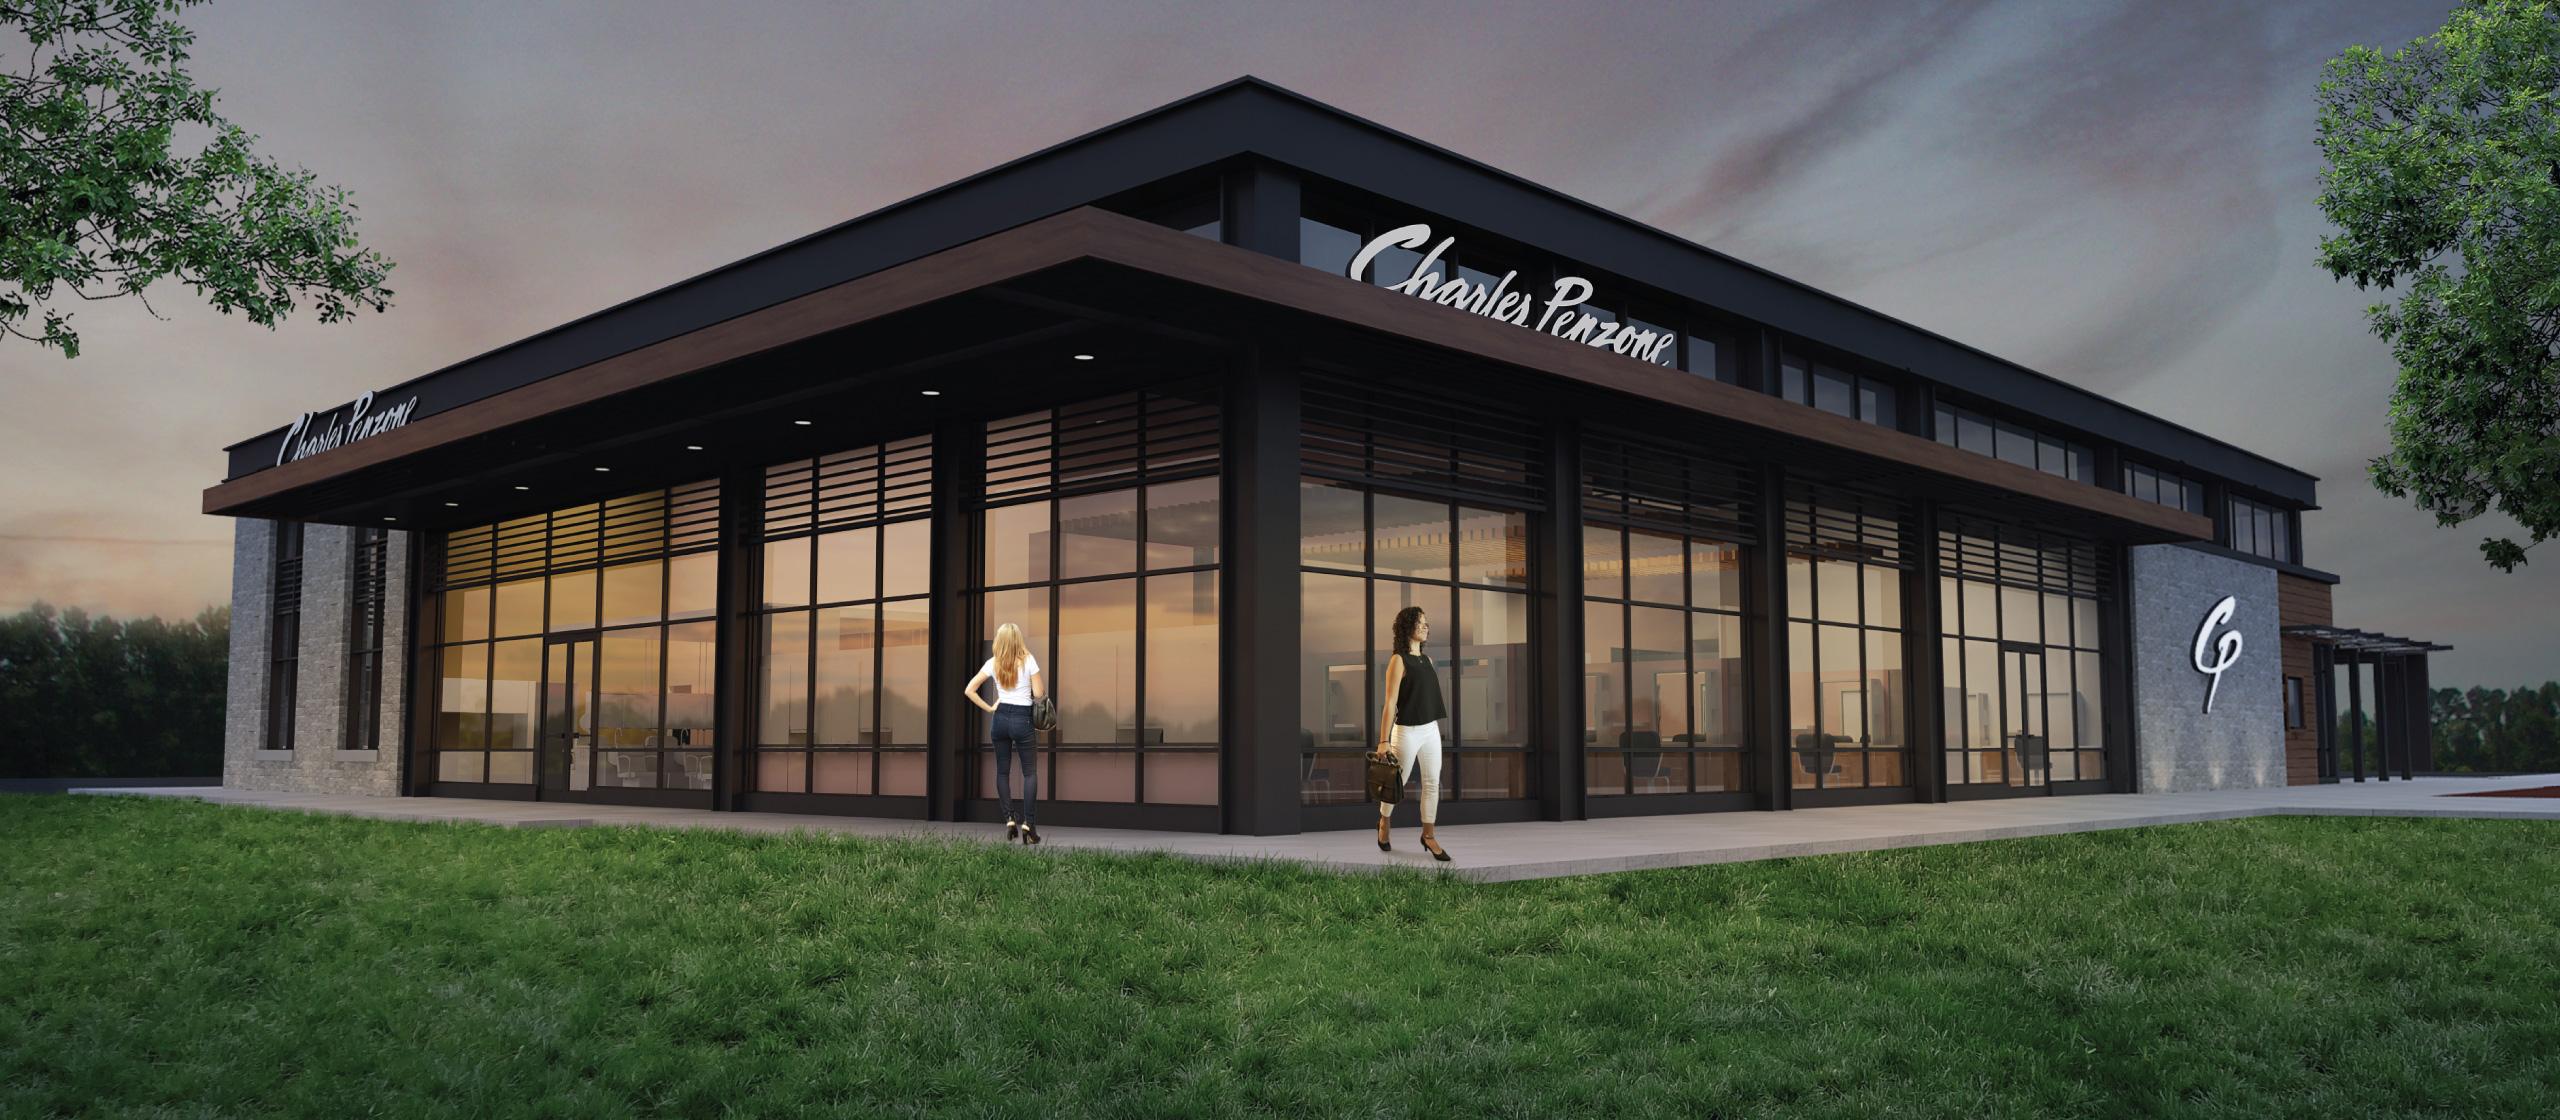 NEW Charles Penzone Dublin Salon Exterior